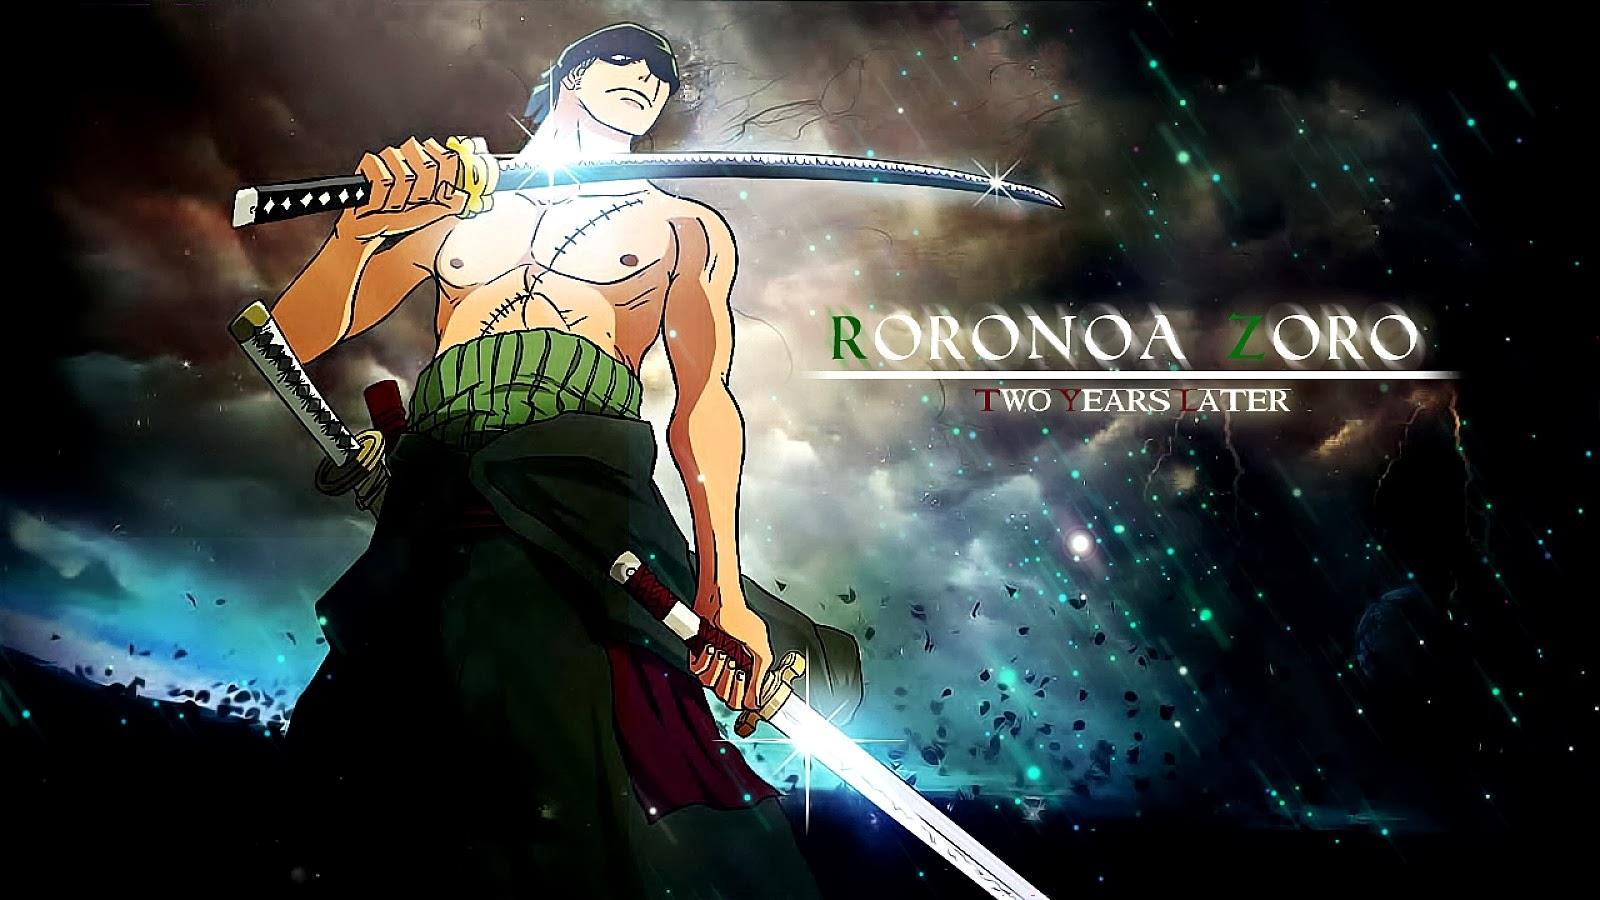 Roronoa zoro (one piece) live wallpaper free download→ subscribe me: Roronoa Zoro Wallpapers - beauty walpaper